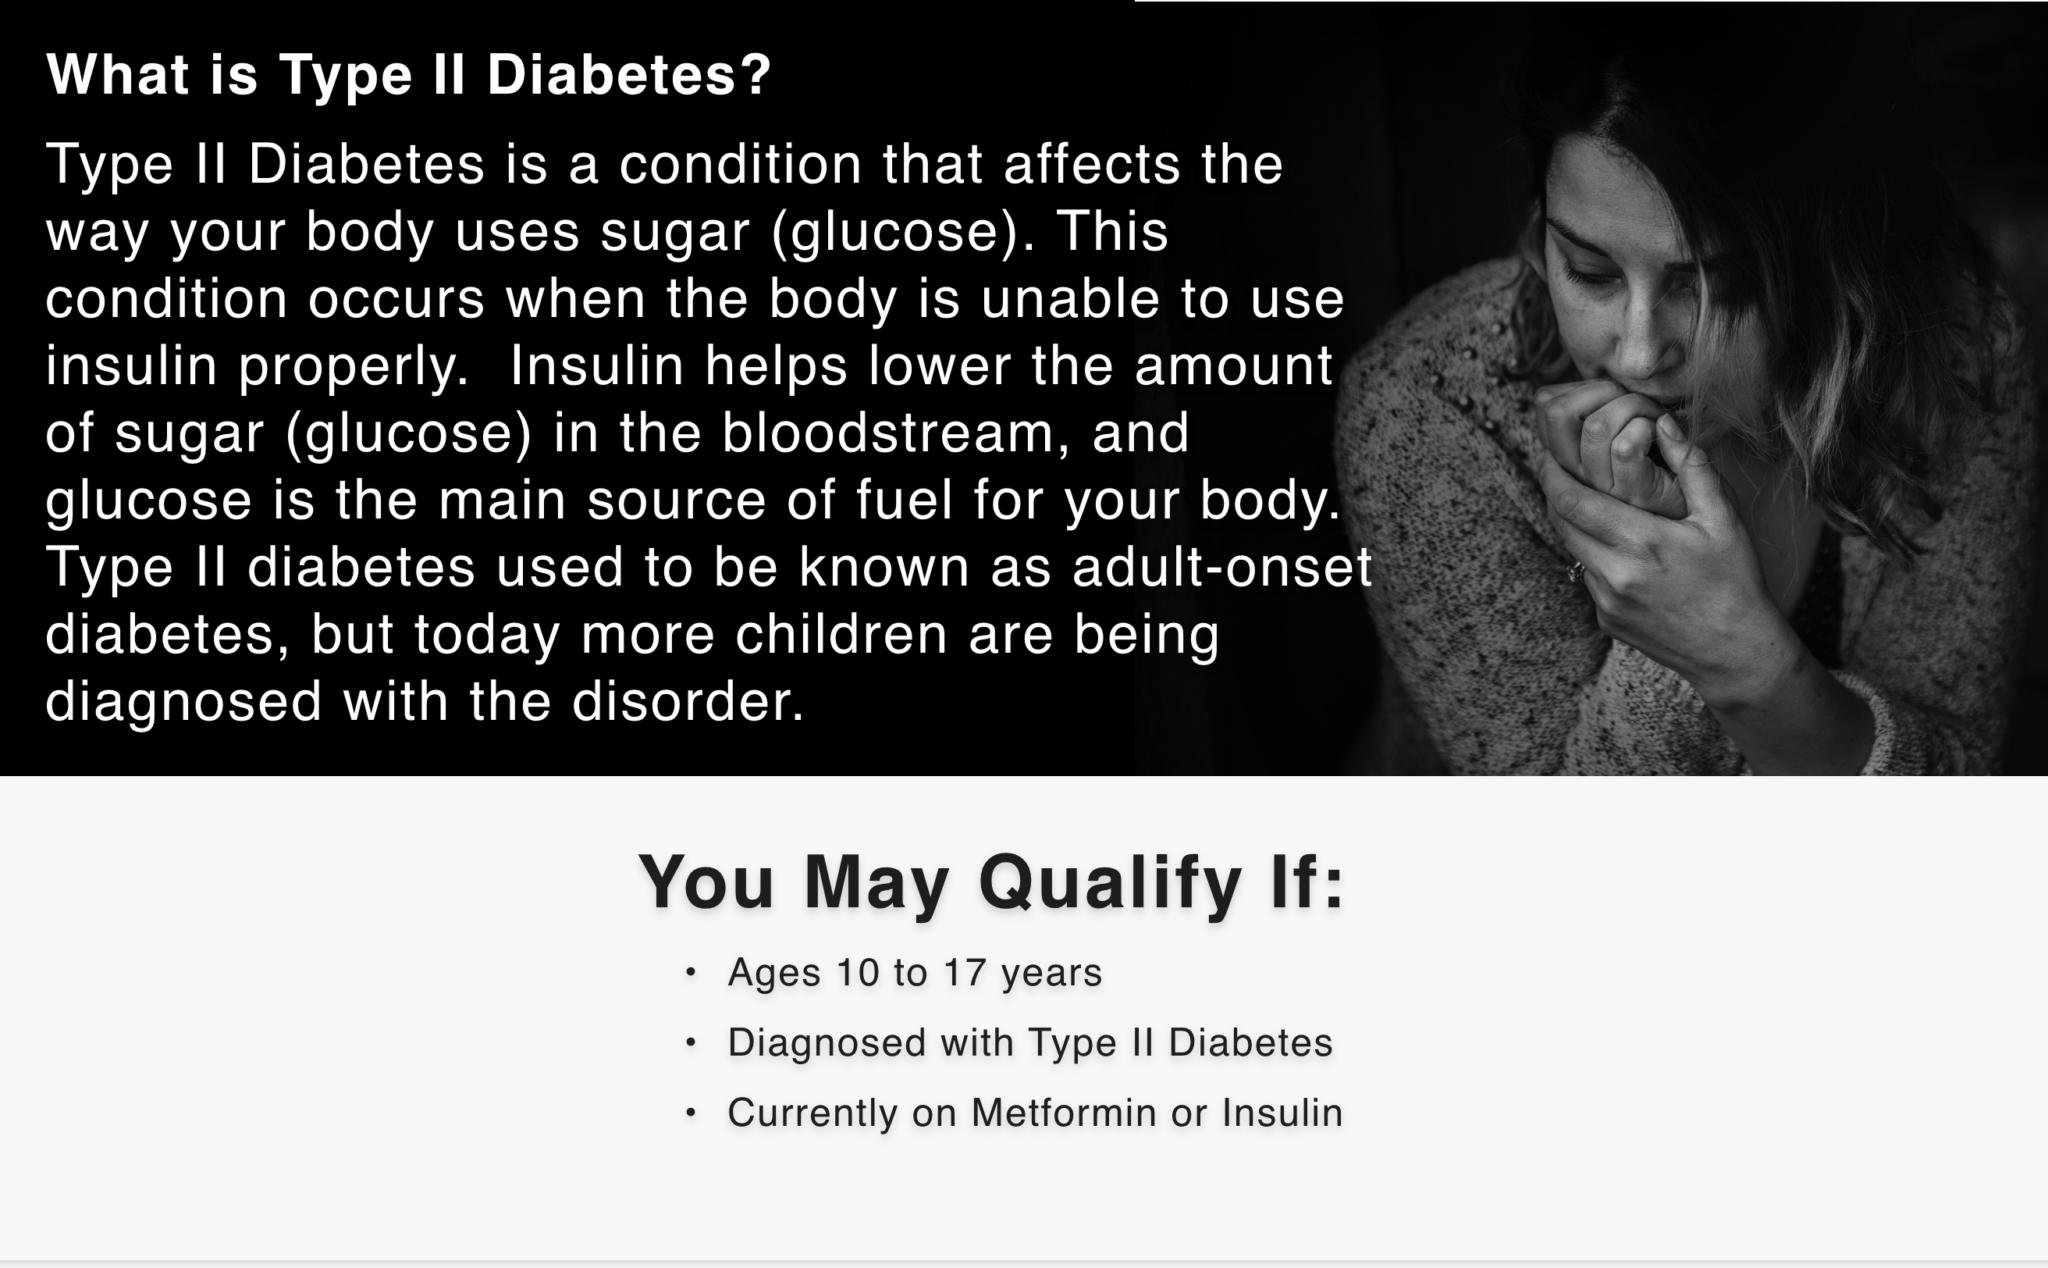 type-ii-diabetes-children-landing-page-info